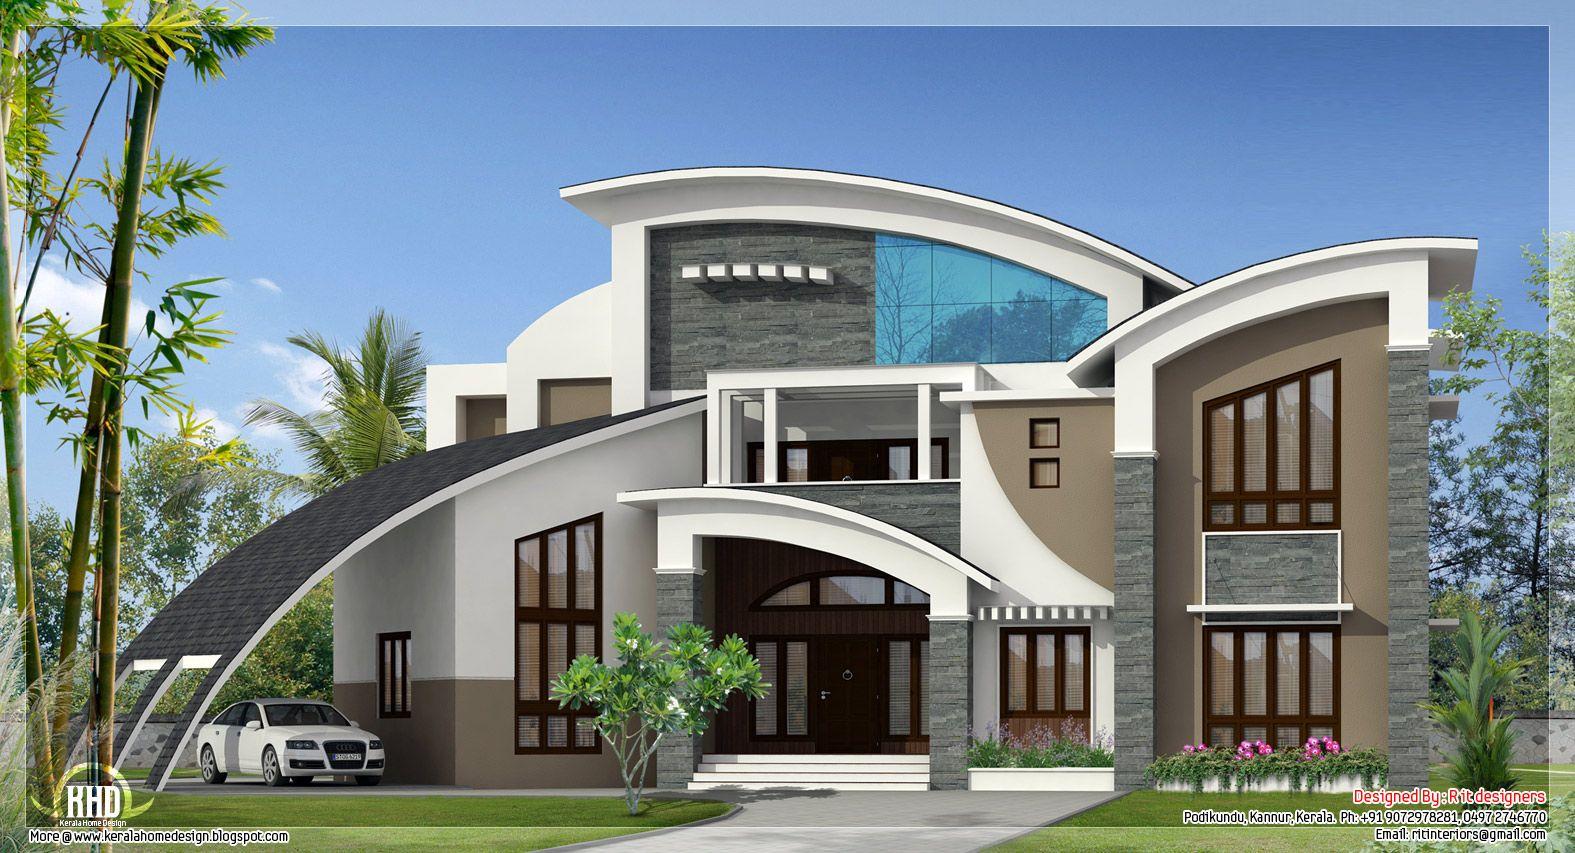 60 Desain Rumah Unik Minimalis Di Dunia Home Fashion Arsitektur